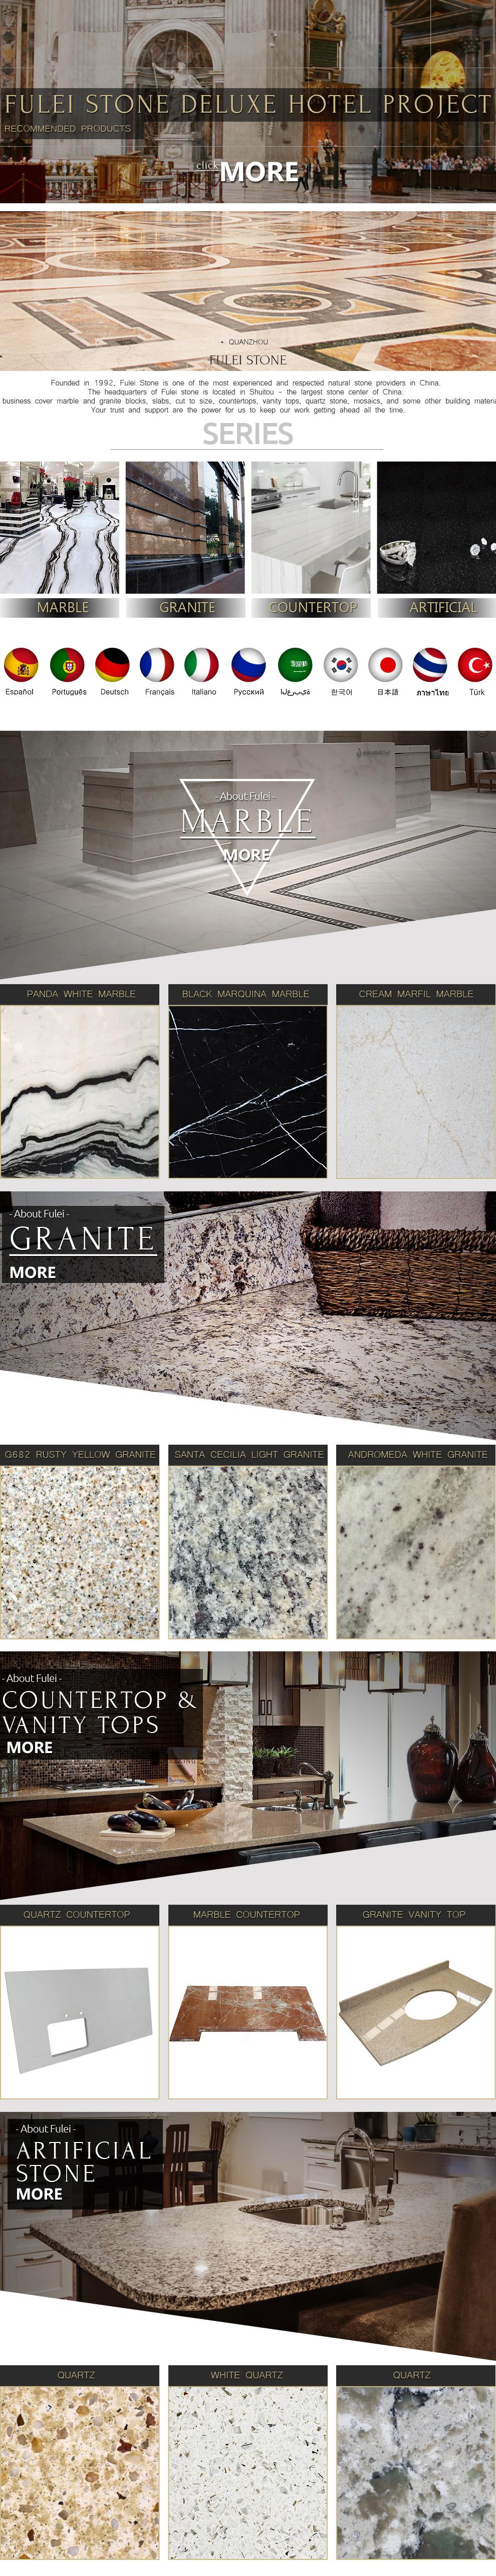 quanzhou fulei stone co., ltd. - stone slab,granite tiles